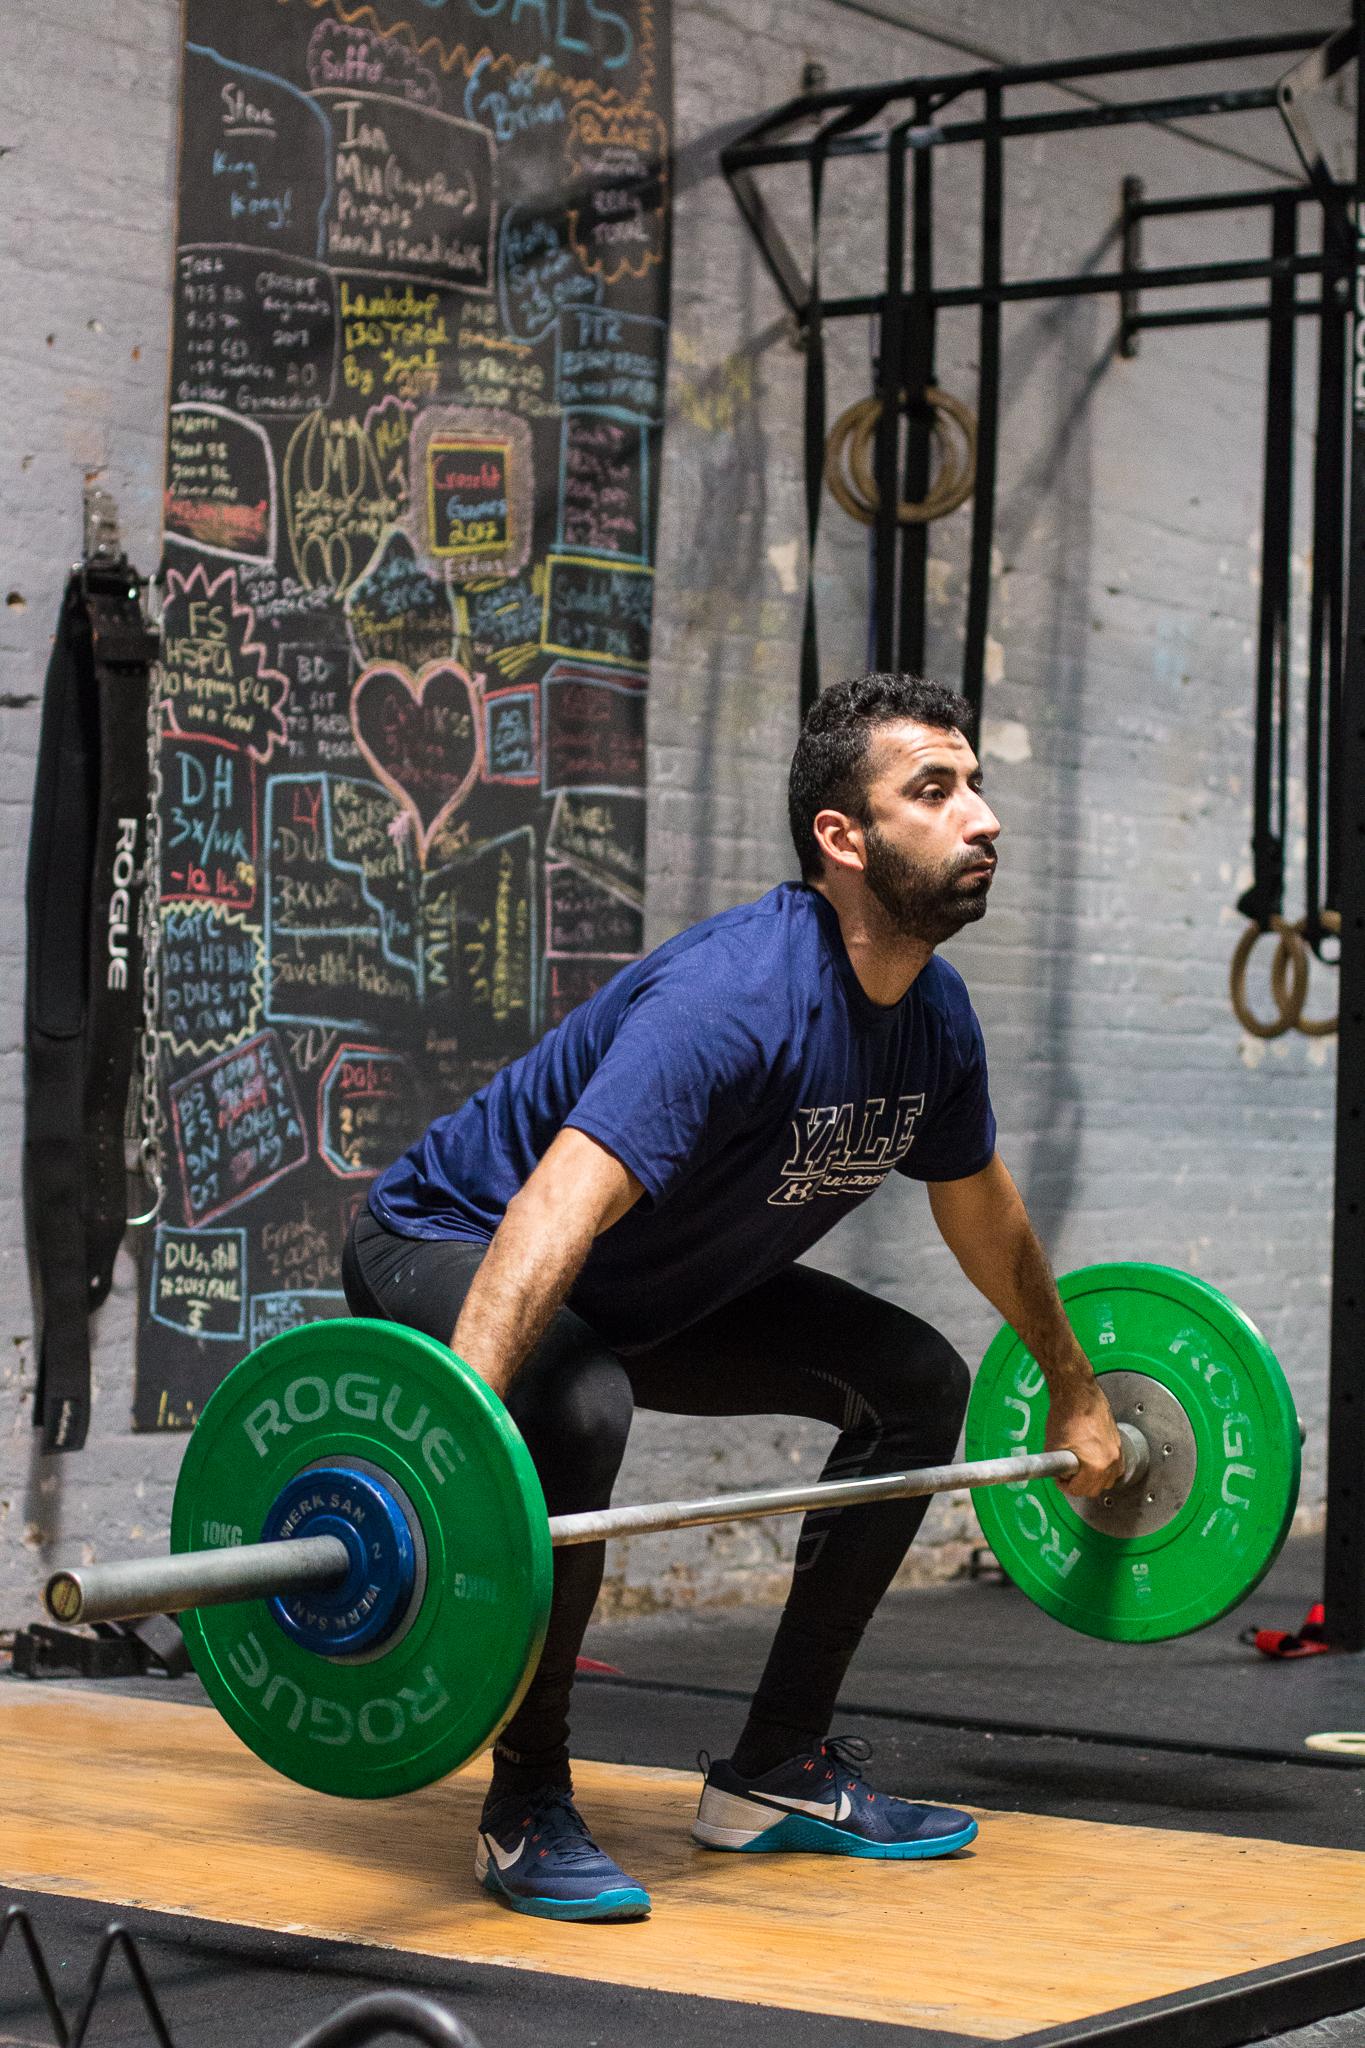 james-wright-visit-brooklyn-new-york-weightlifting-coach-teammates-october-2016 (20 of 92).jpg